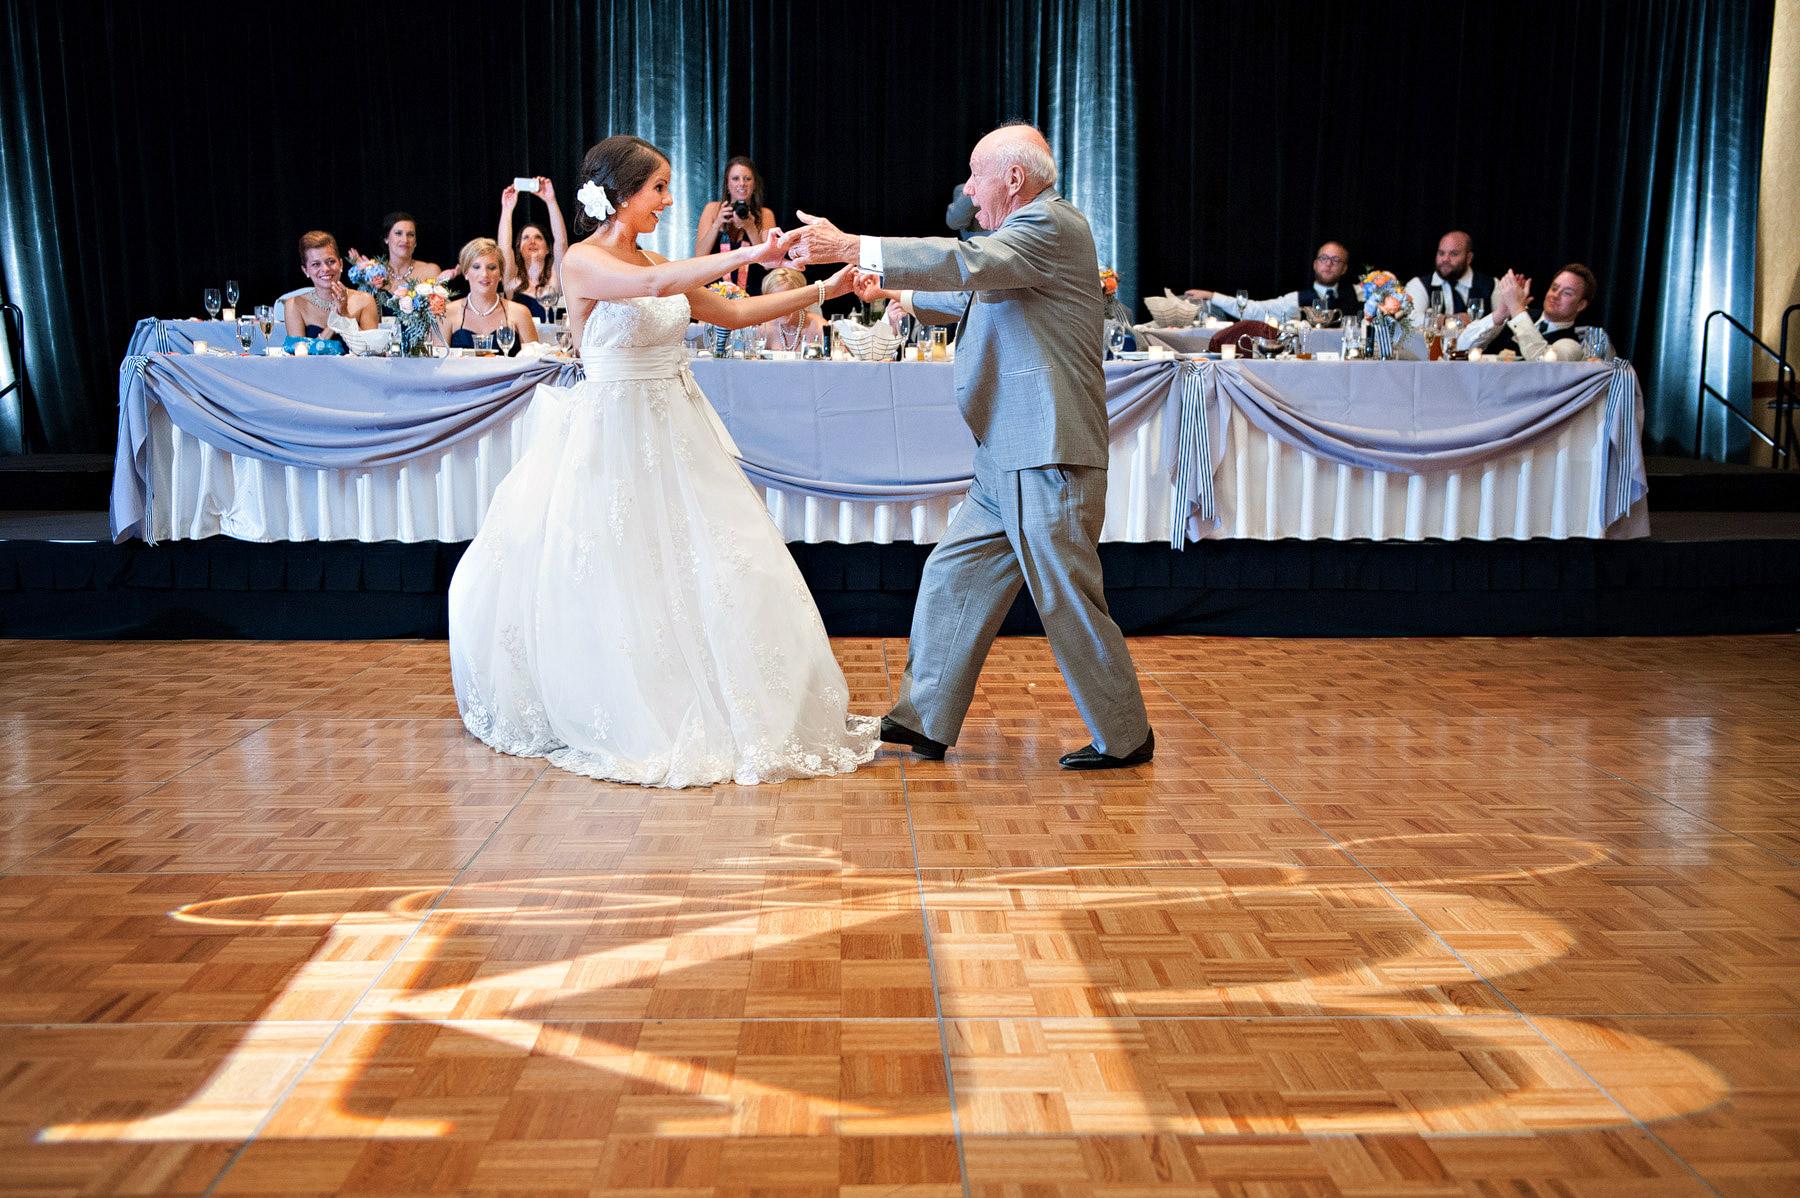 wedding-photography-saint-paul-mark-kegans-646.jpg